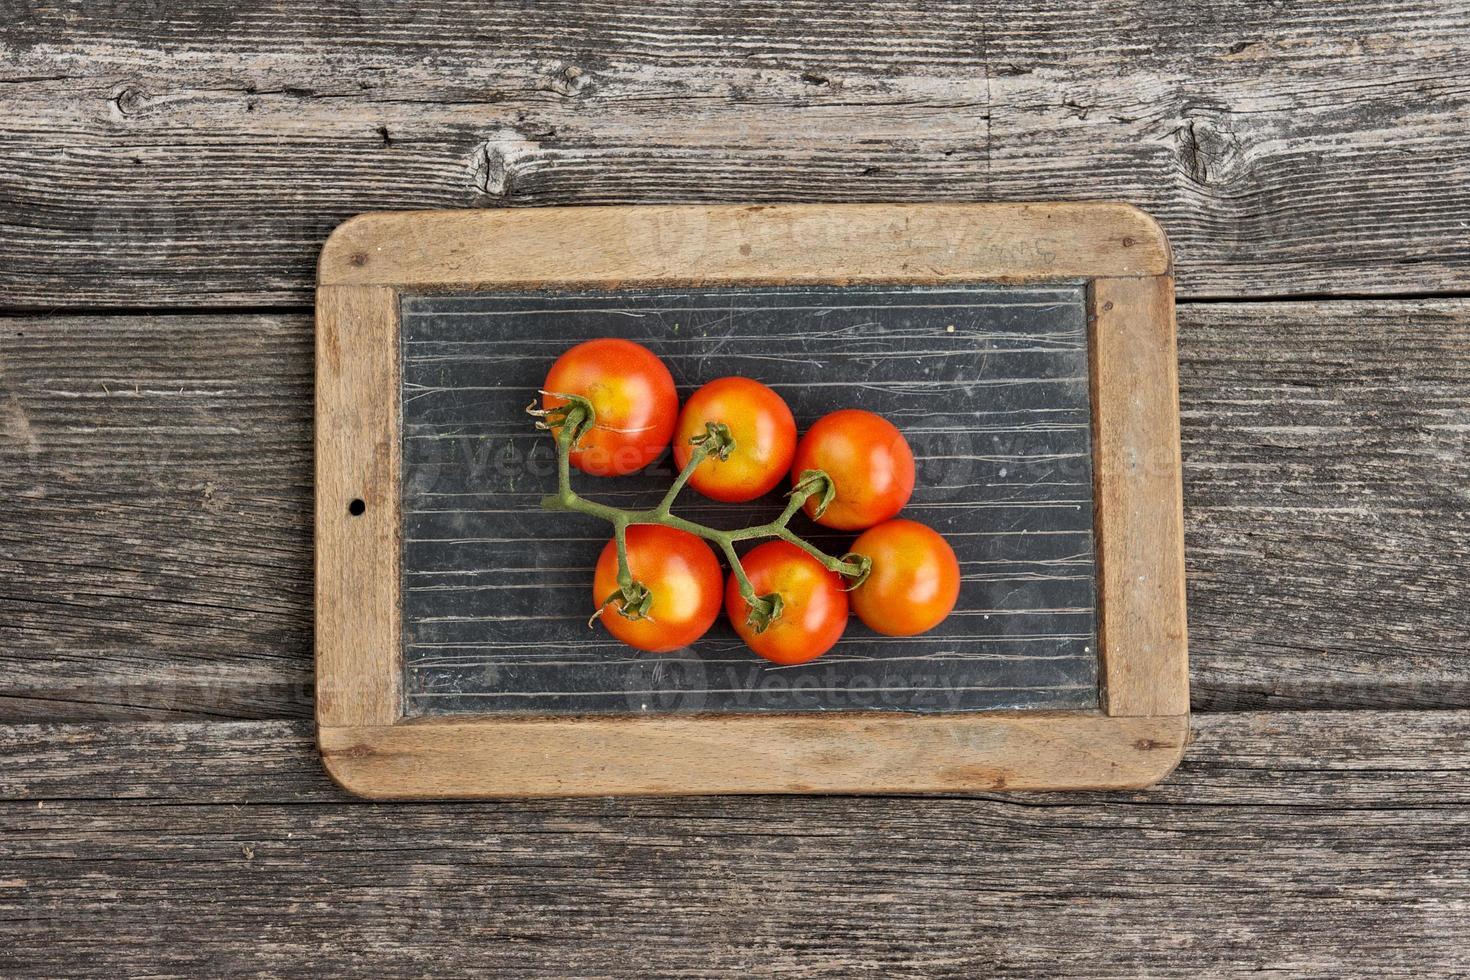 tomate na lousa escrita tablet foto